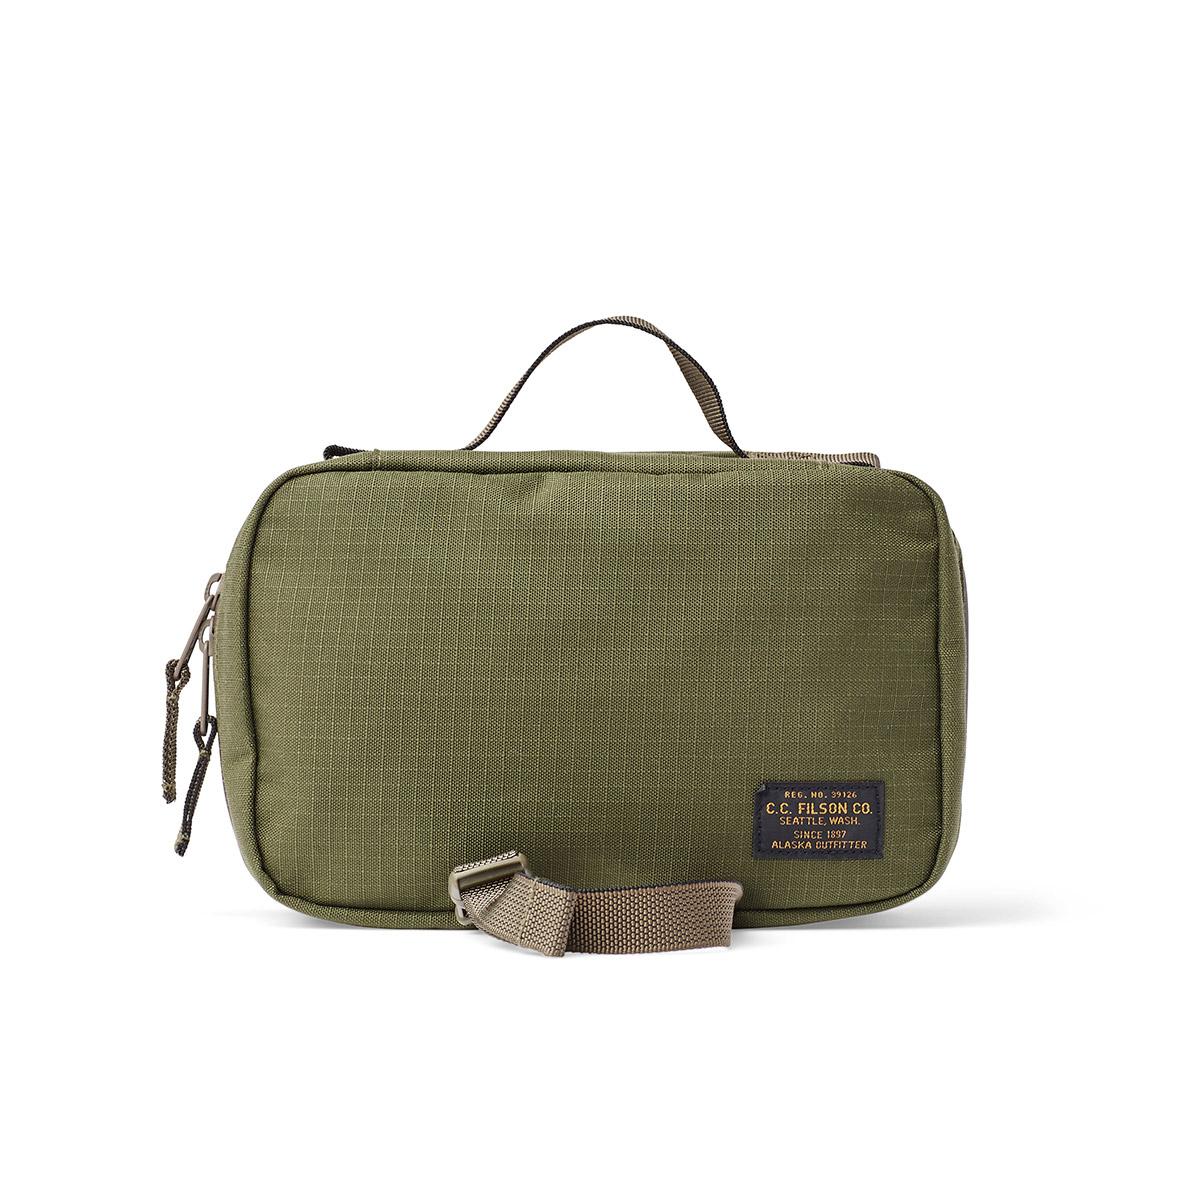 Filson Ripstop Nylon Travel Pack 20115936-Surplus Green